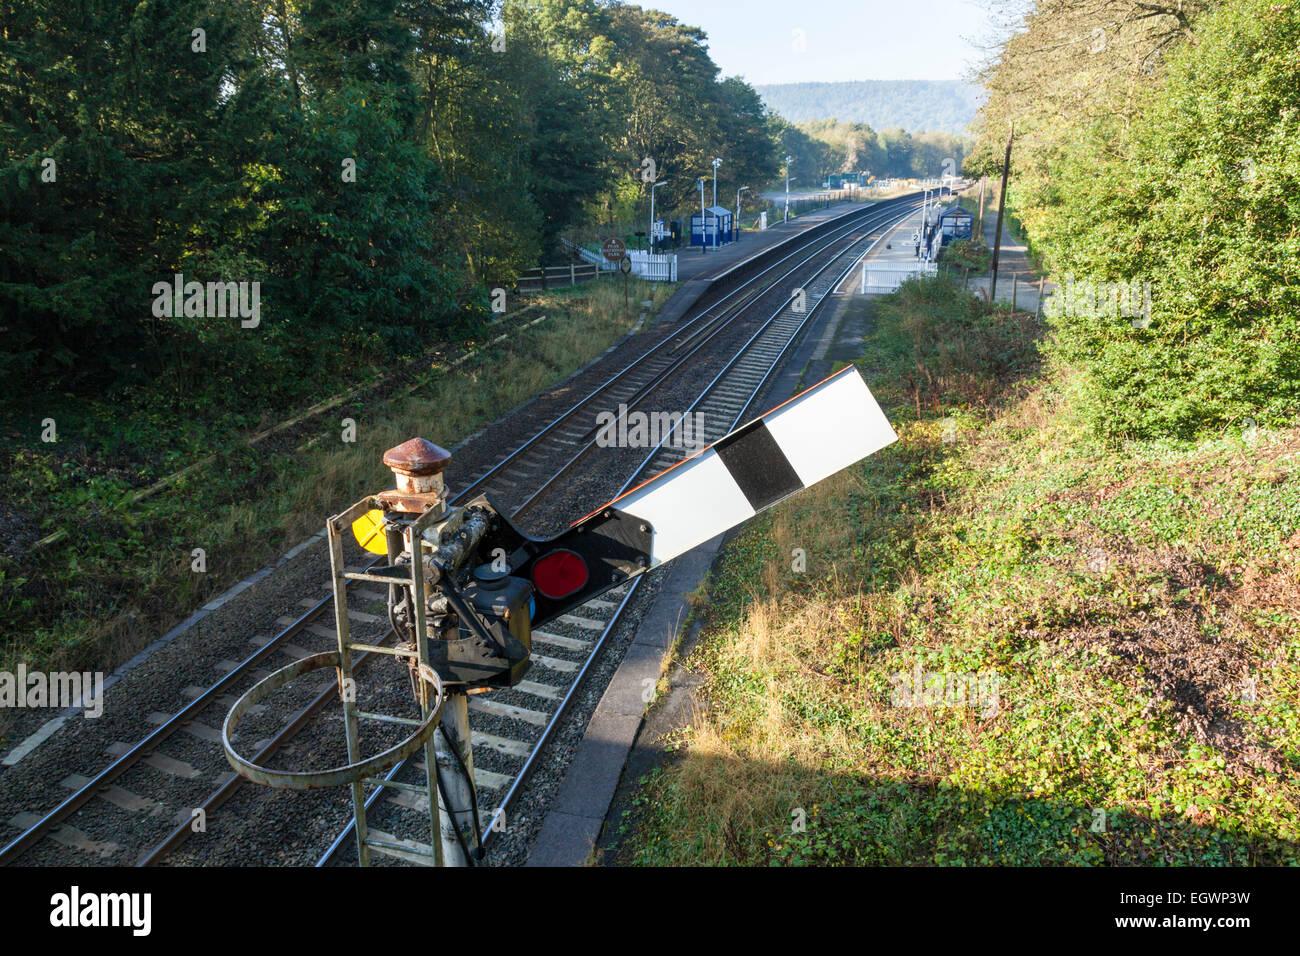 Railway signalling. Semaphore signal at clear, Grindleford Railway Station, Derbyshire, Peak District National Park, Stock Photo